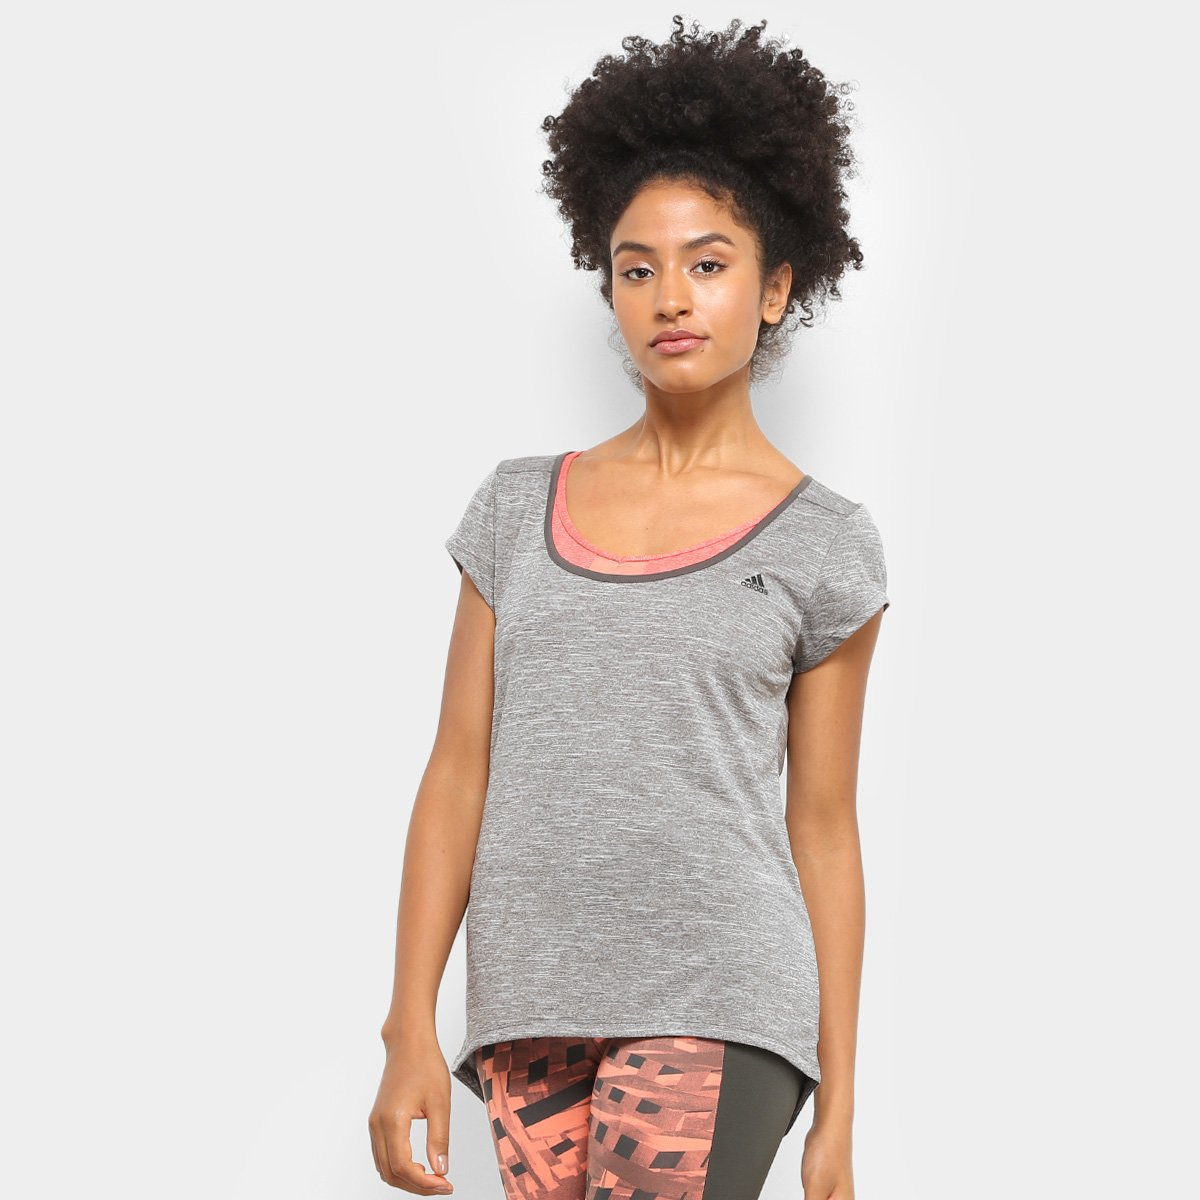 Camiseta e Adidas Baby Feminina Adidas Preto Baby Camiseta Bro Cinza dxZtf8